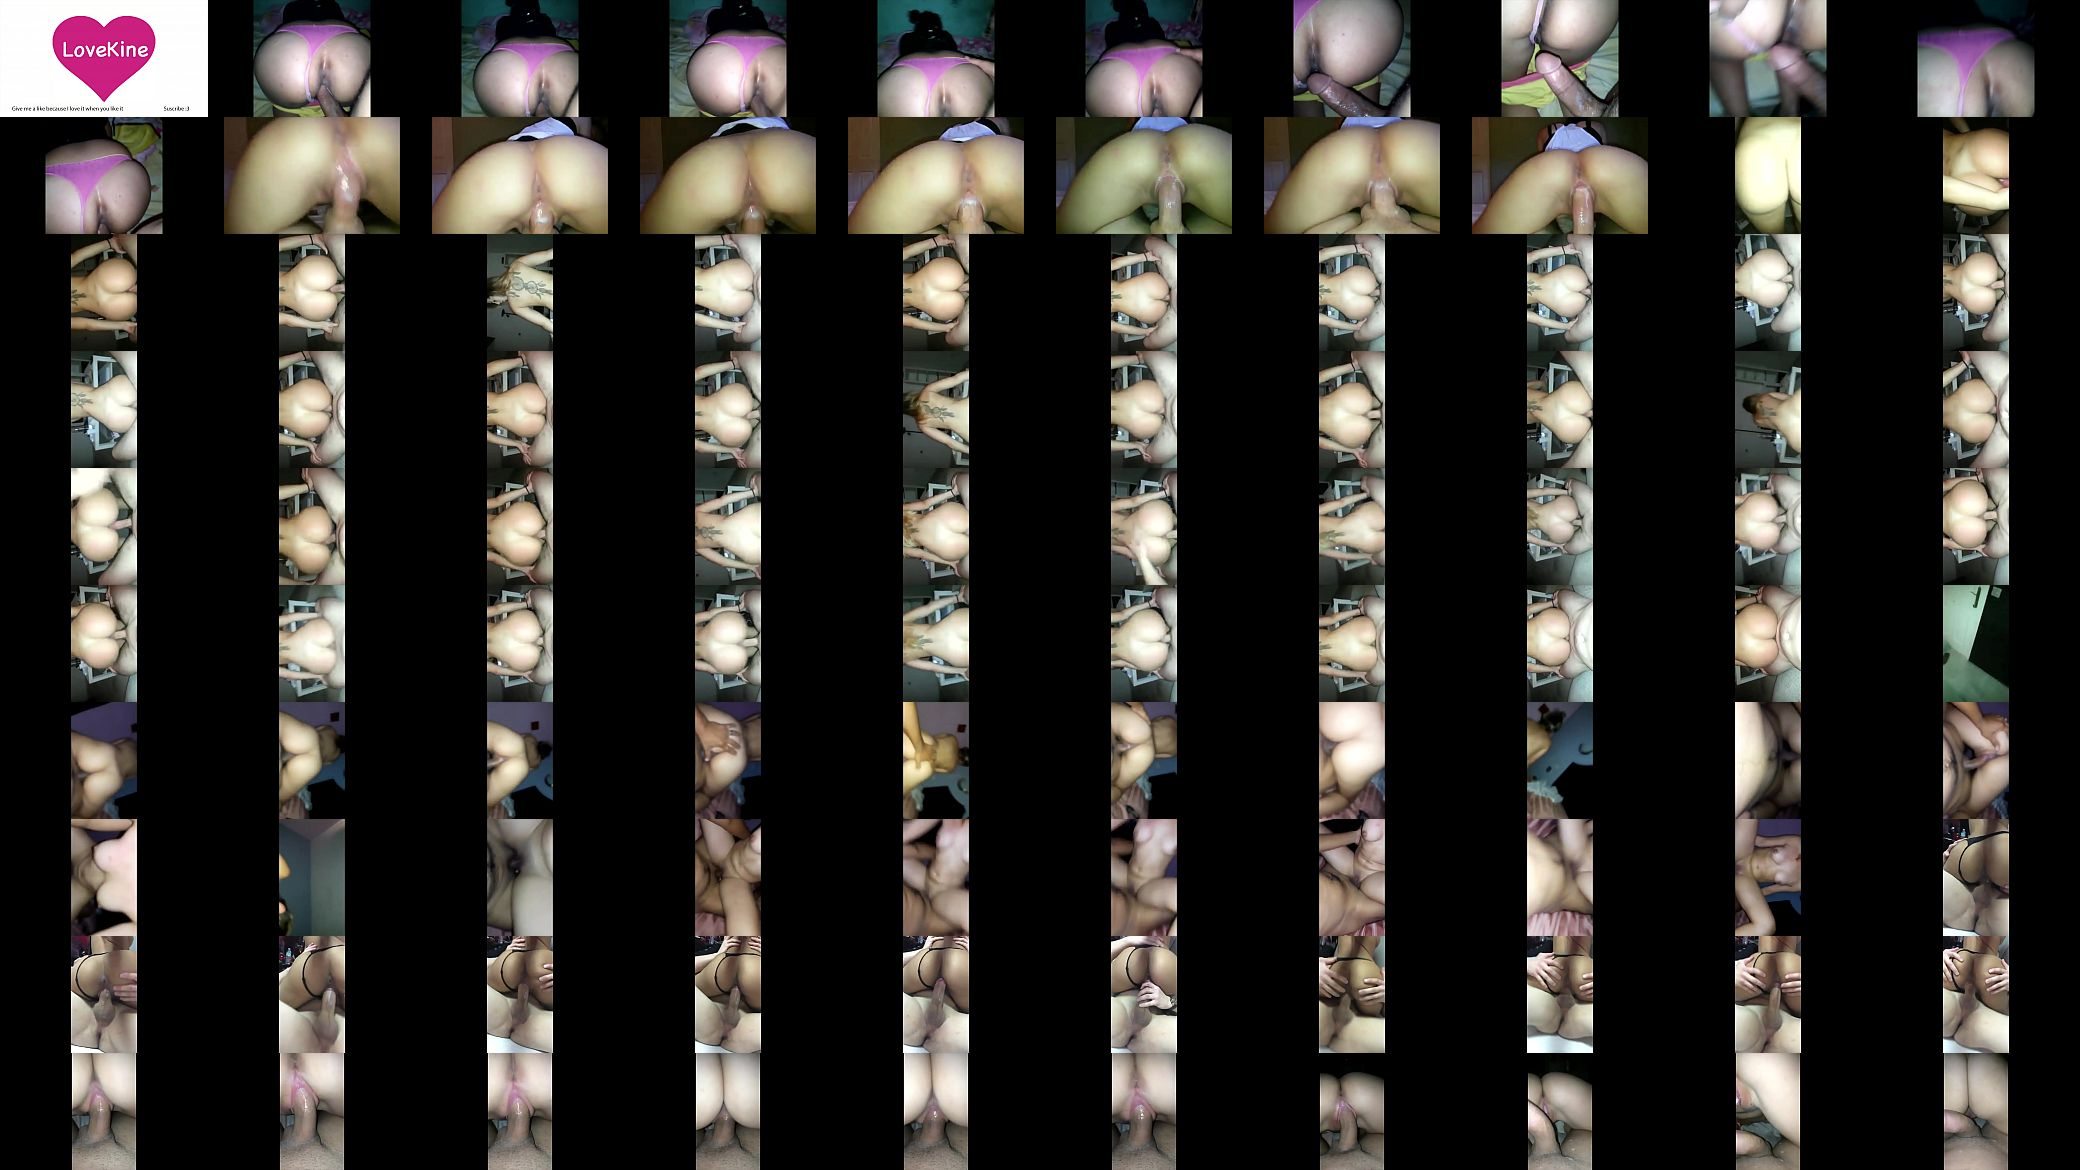 Pagina Porno Culonder xvideo3 - xvideos